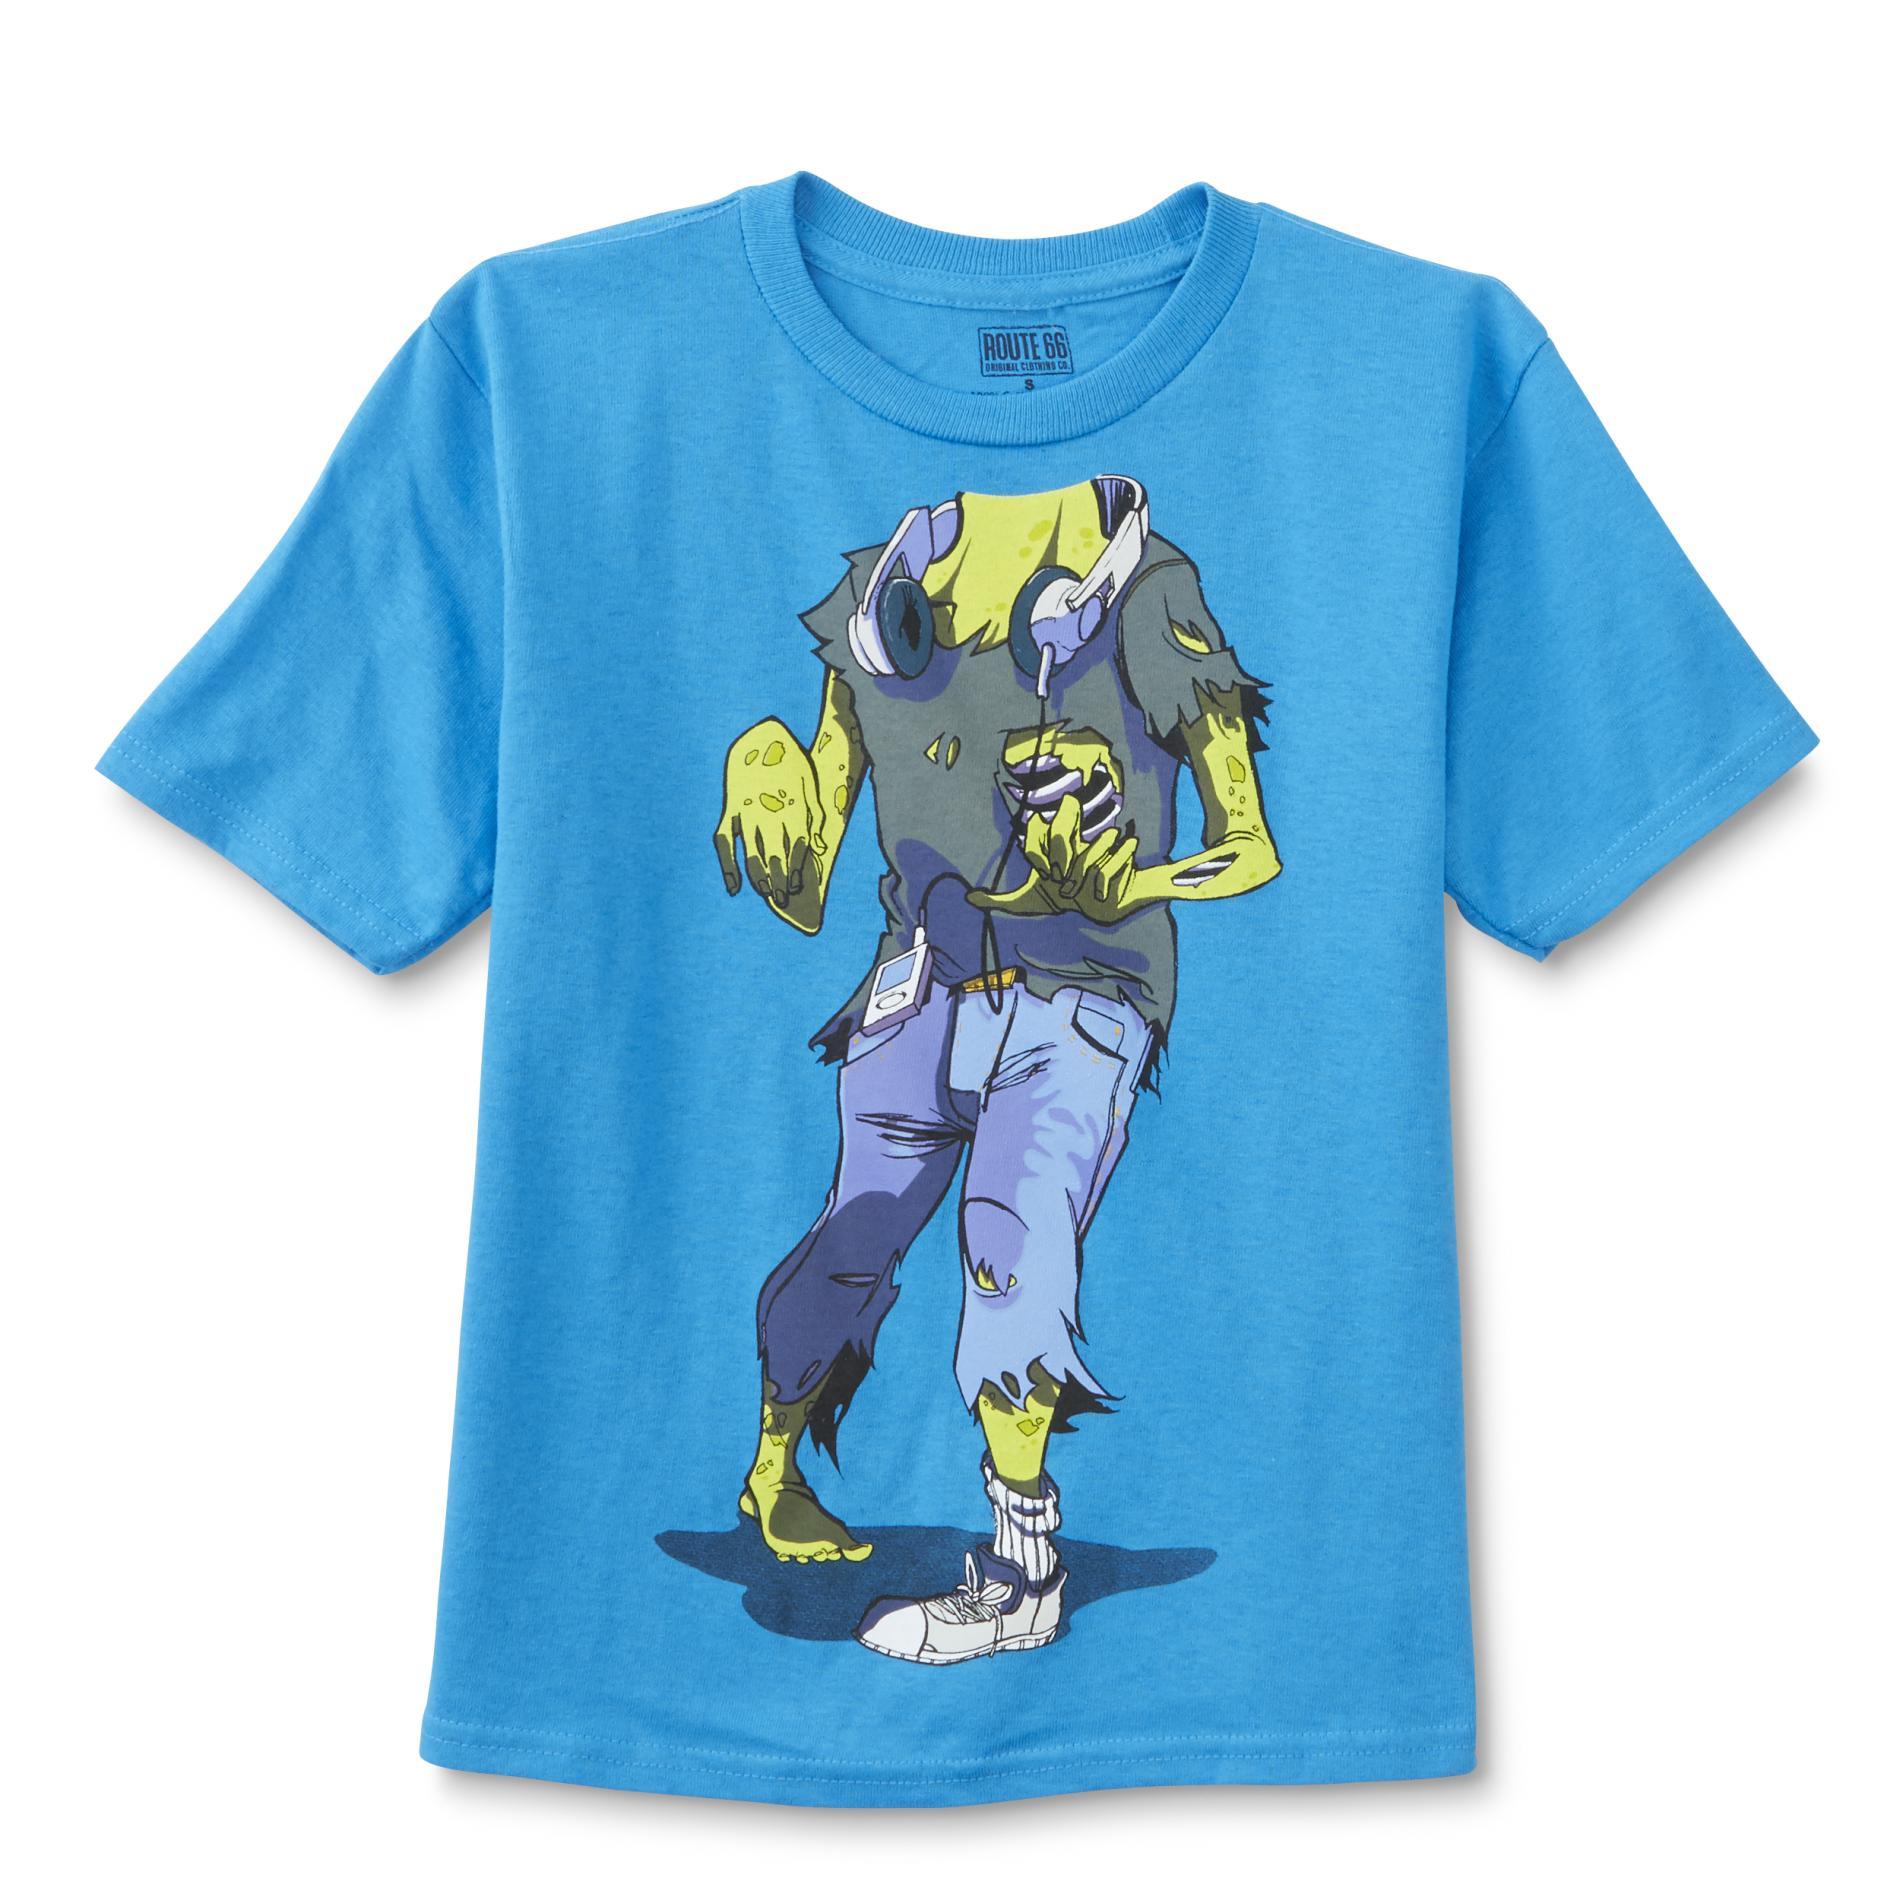 Boy's Graphic T-Shirt - Zombie